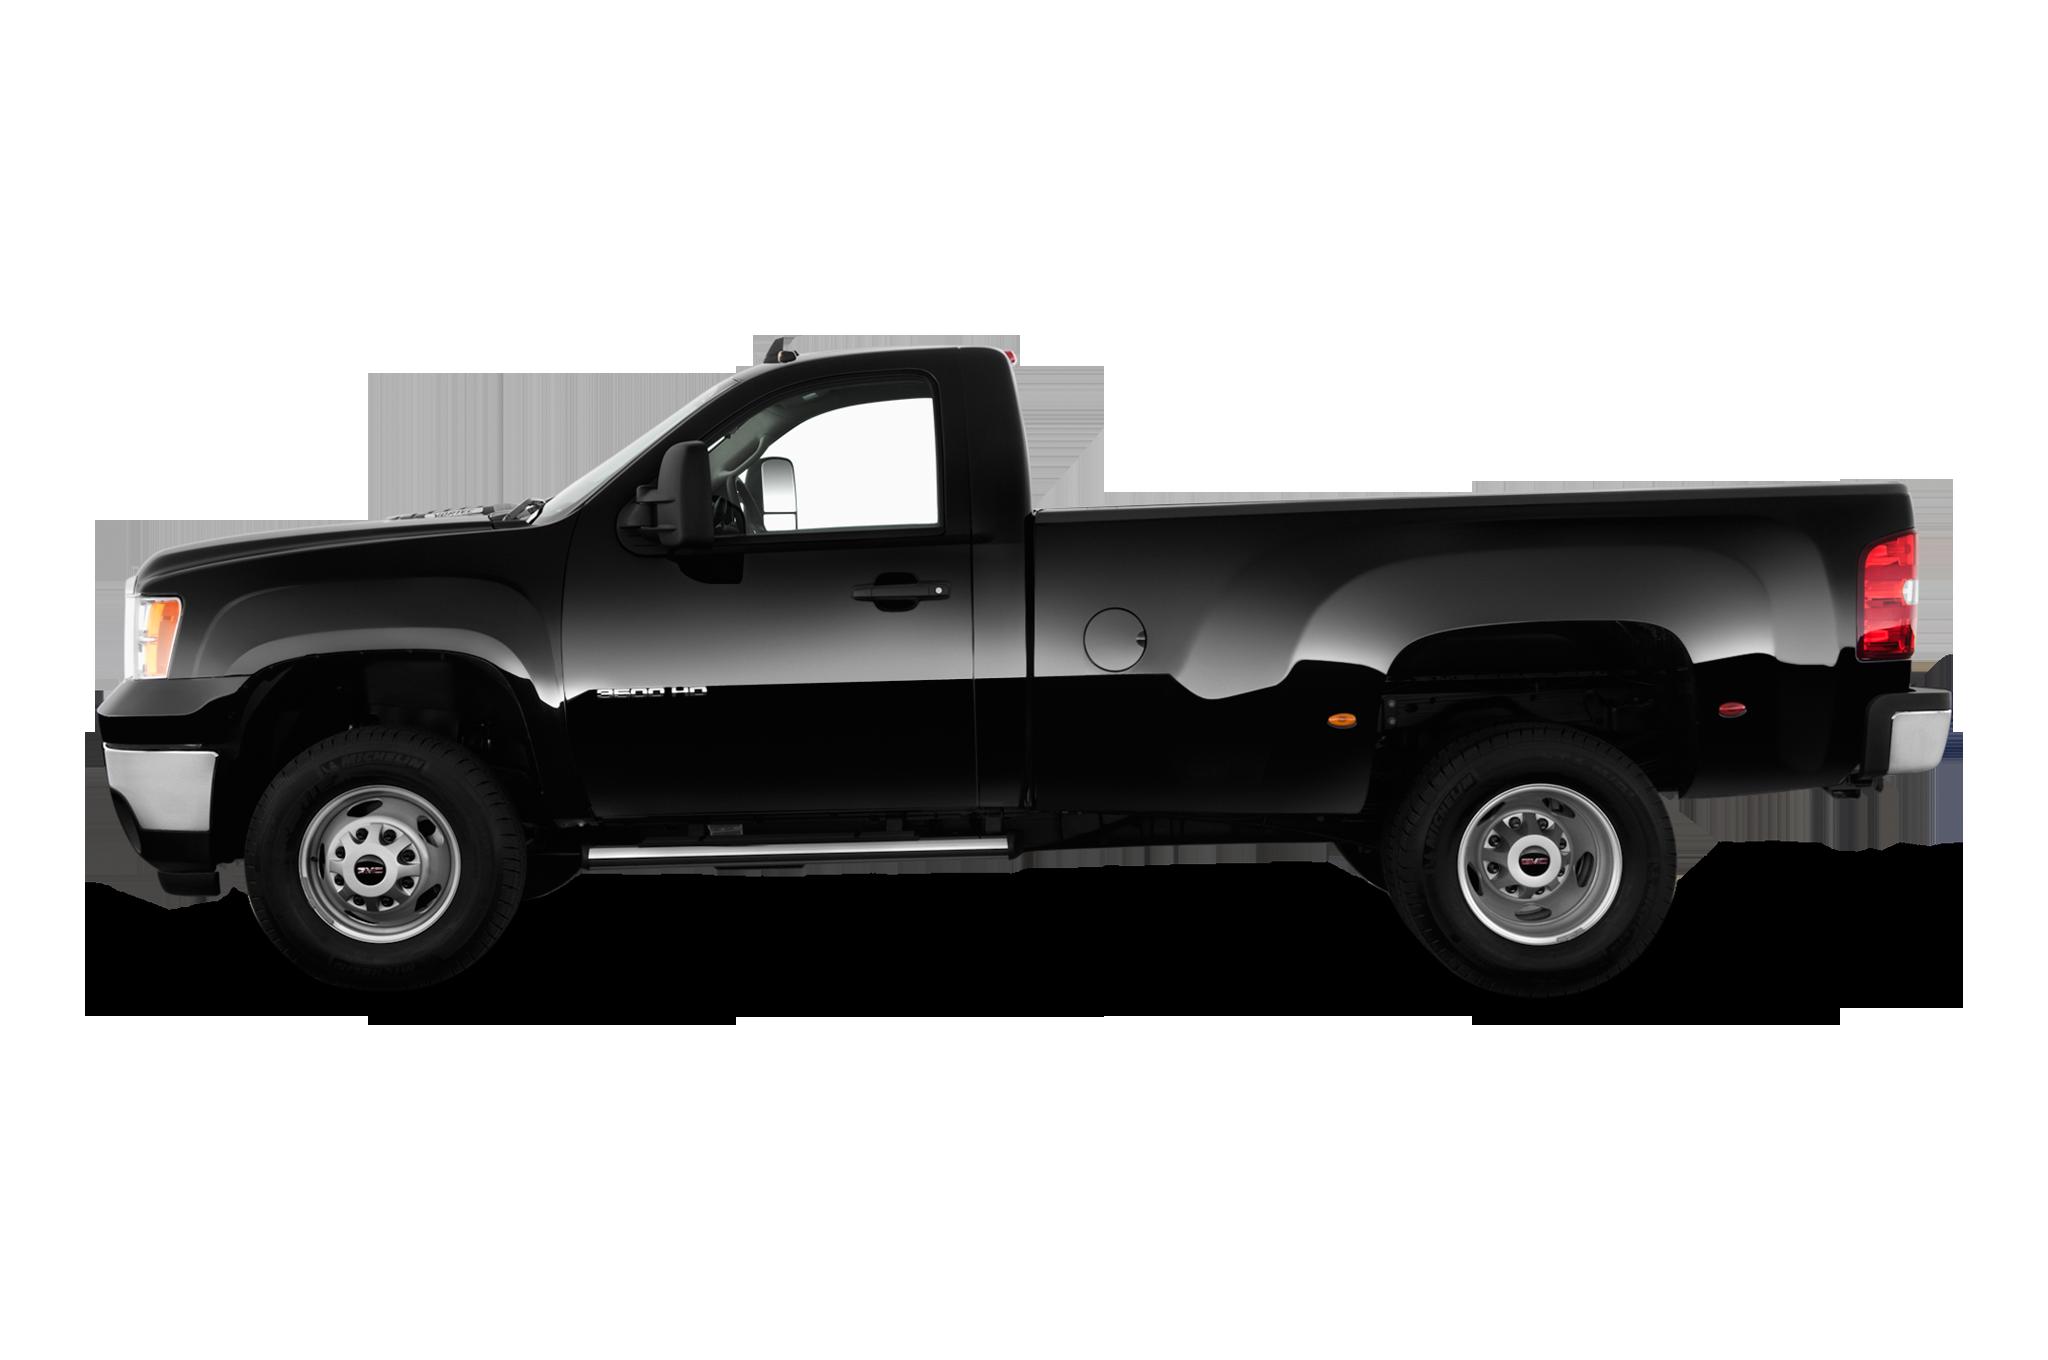 Pickup truck pumpkin clipart vector freeuse download 2011 GMC Sierra 3500 HD Crew Cab SLT 4x4 - Automobile Magazine vector freeuse download